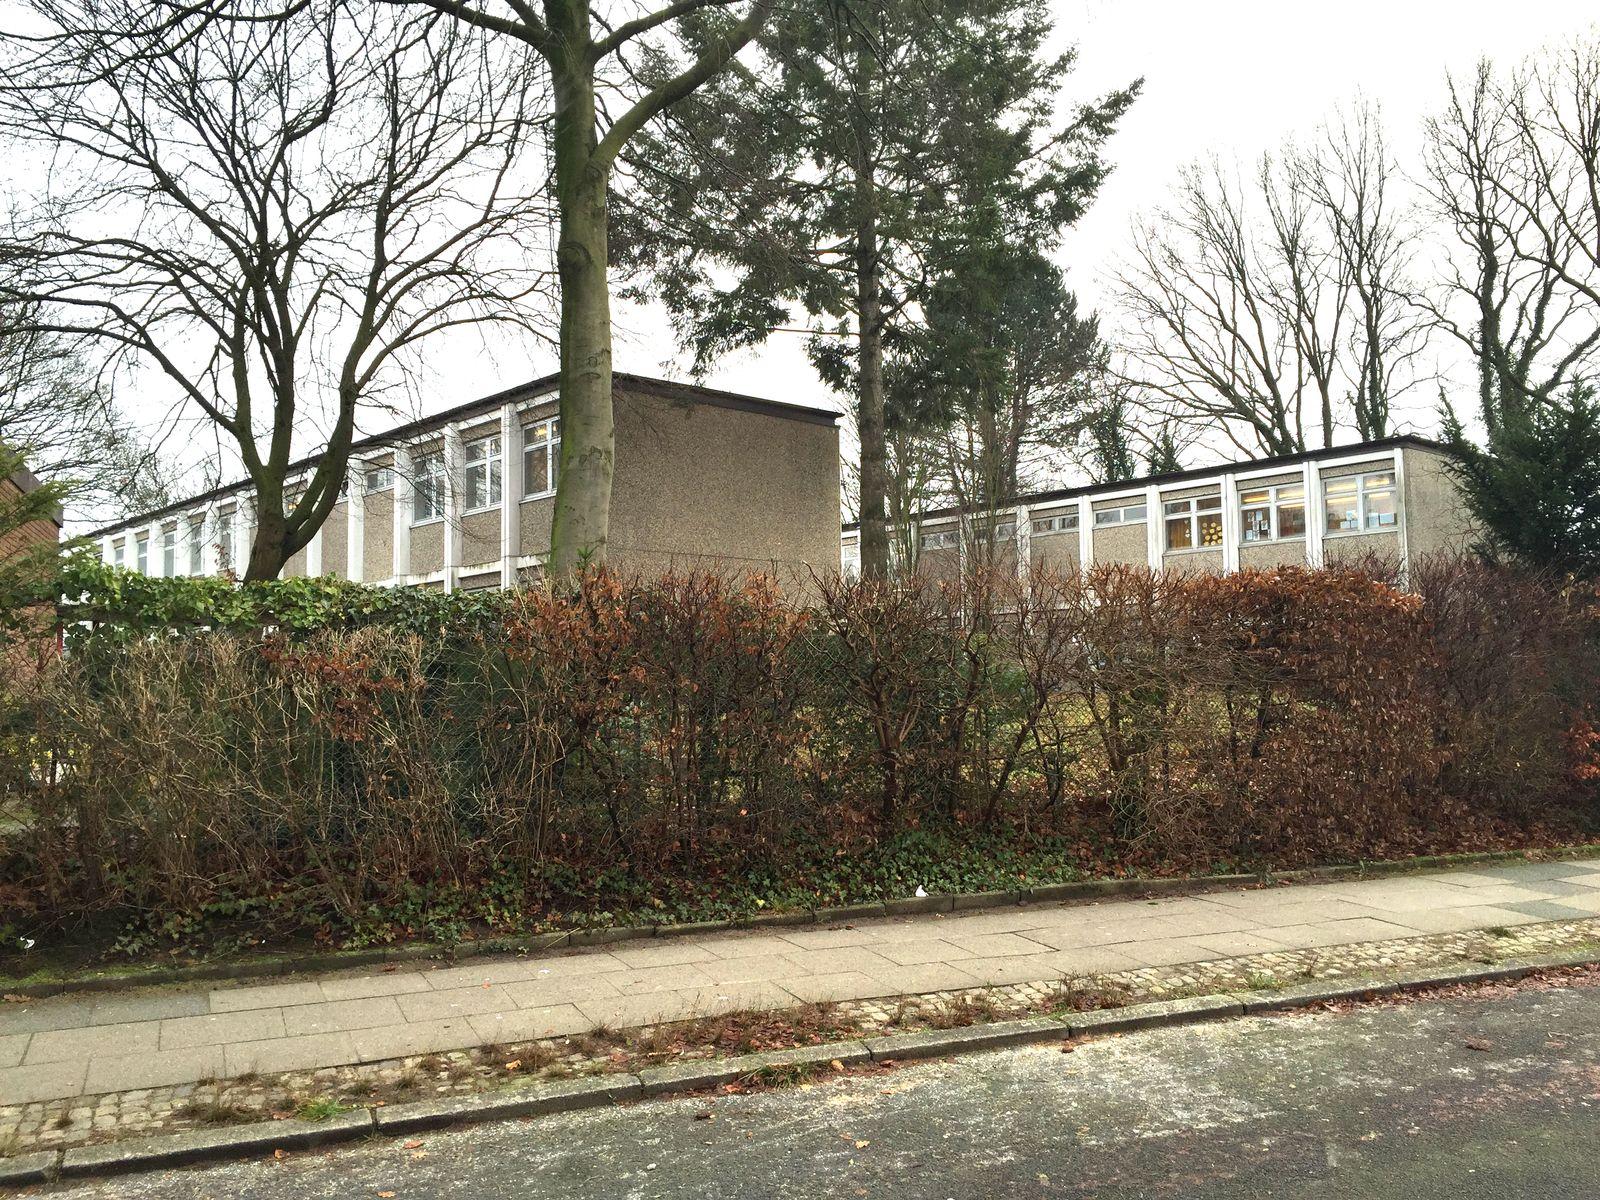 Hamburg/ Flüchtlingsheim Langenhorn/ Grellkamp